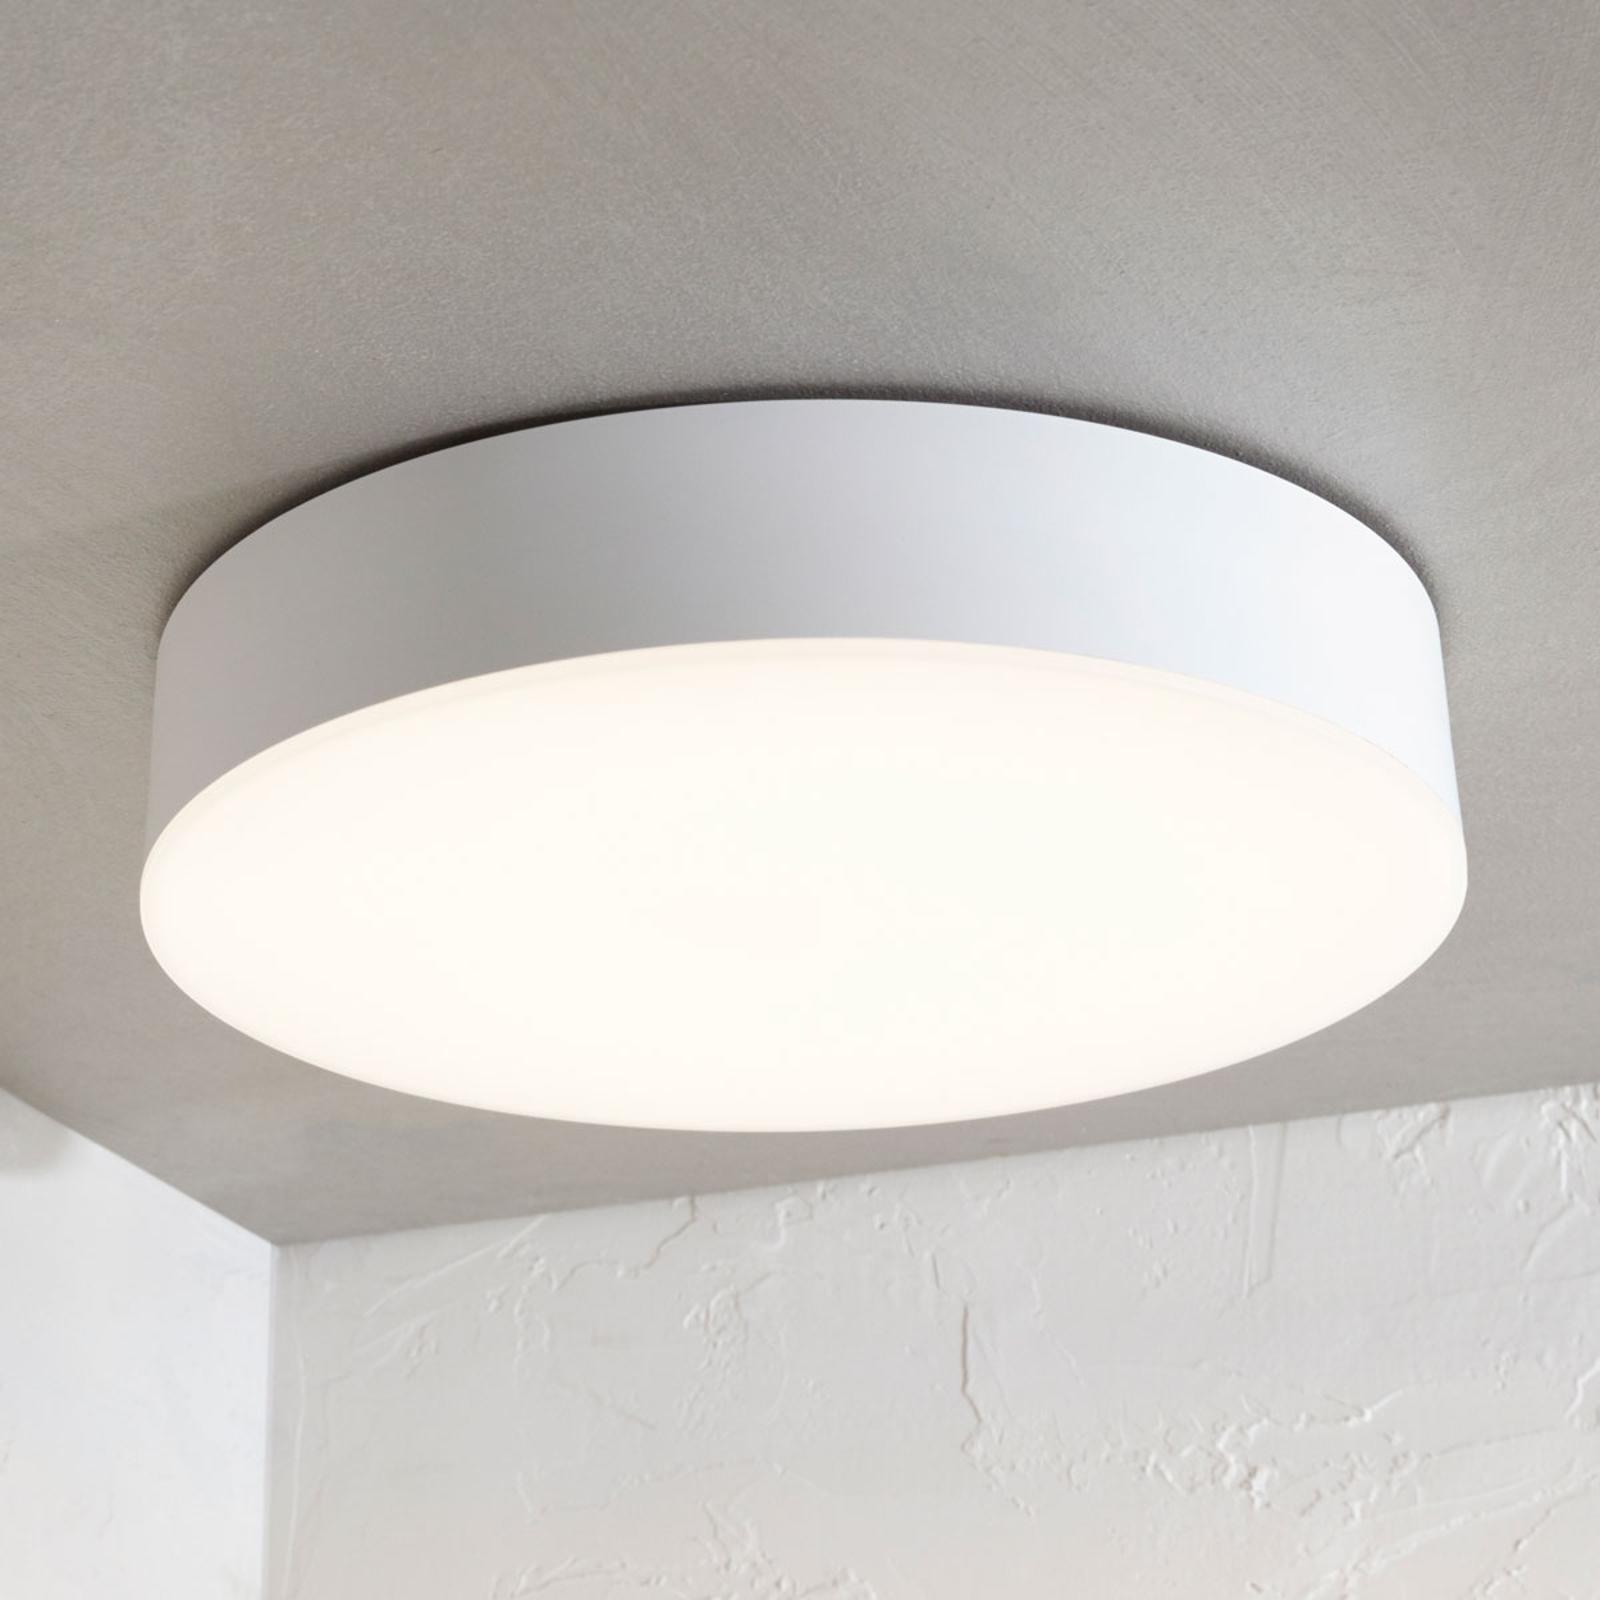 Lampa sufitowa LED Lahja, IP65, biała